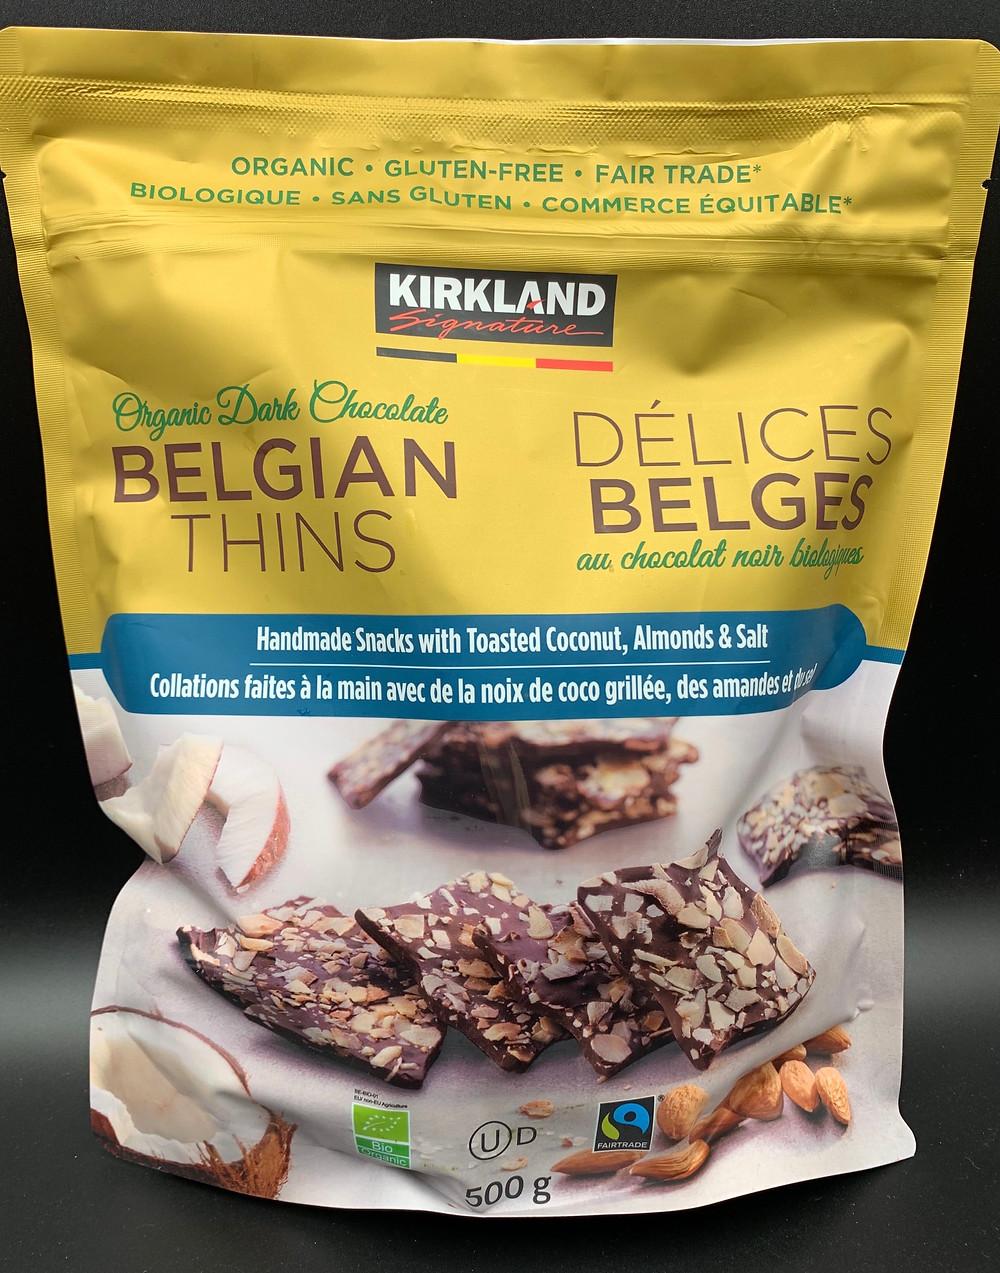 Costco Kirkland Signature Organic Dark Chocolate Belgian Thins